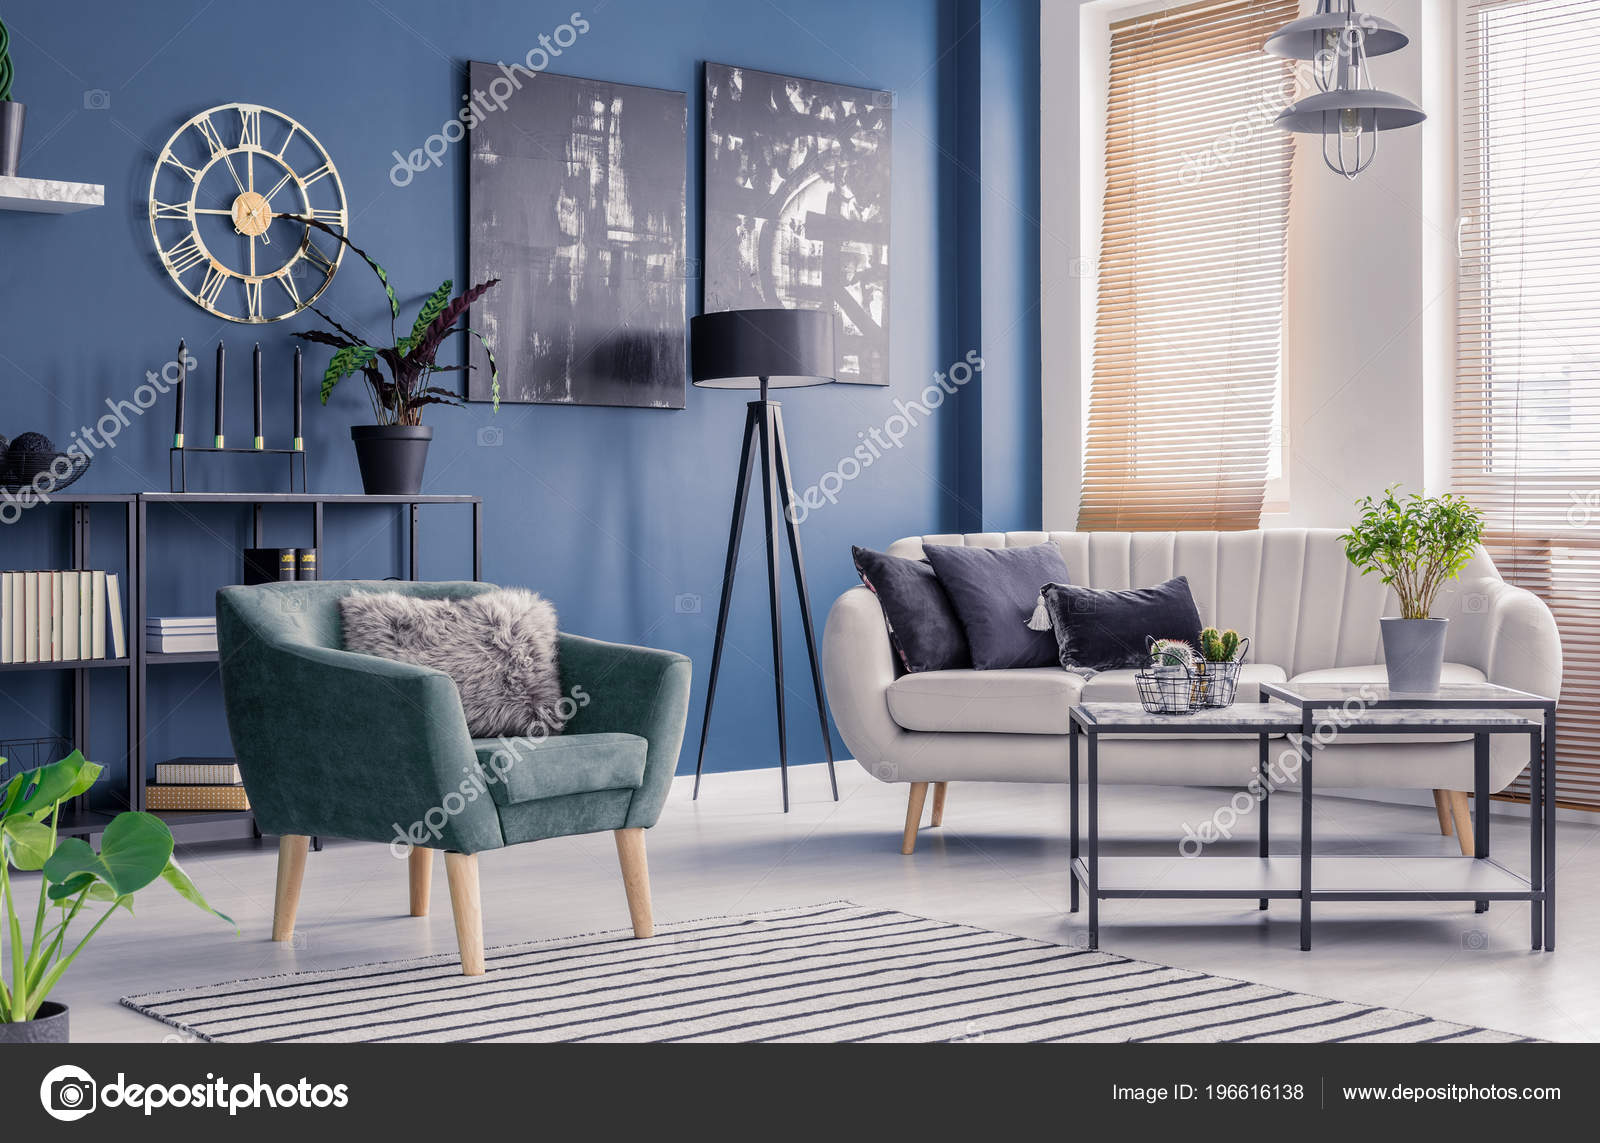 marineblauwe woonkamer interieur met designer inrichting zwarte artwork elegante comfortabele stockfoto